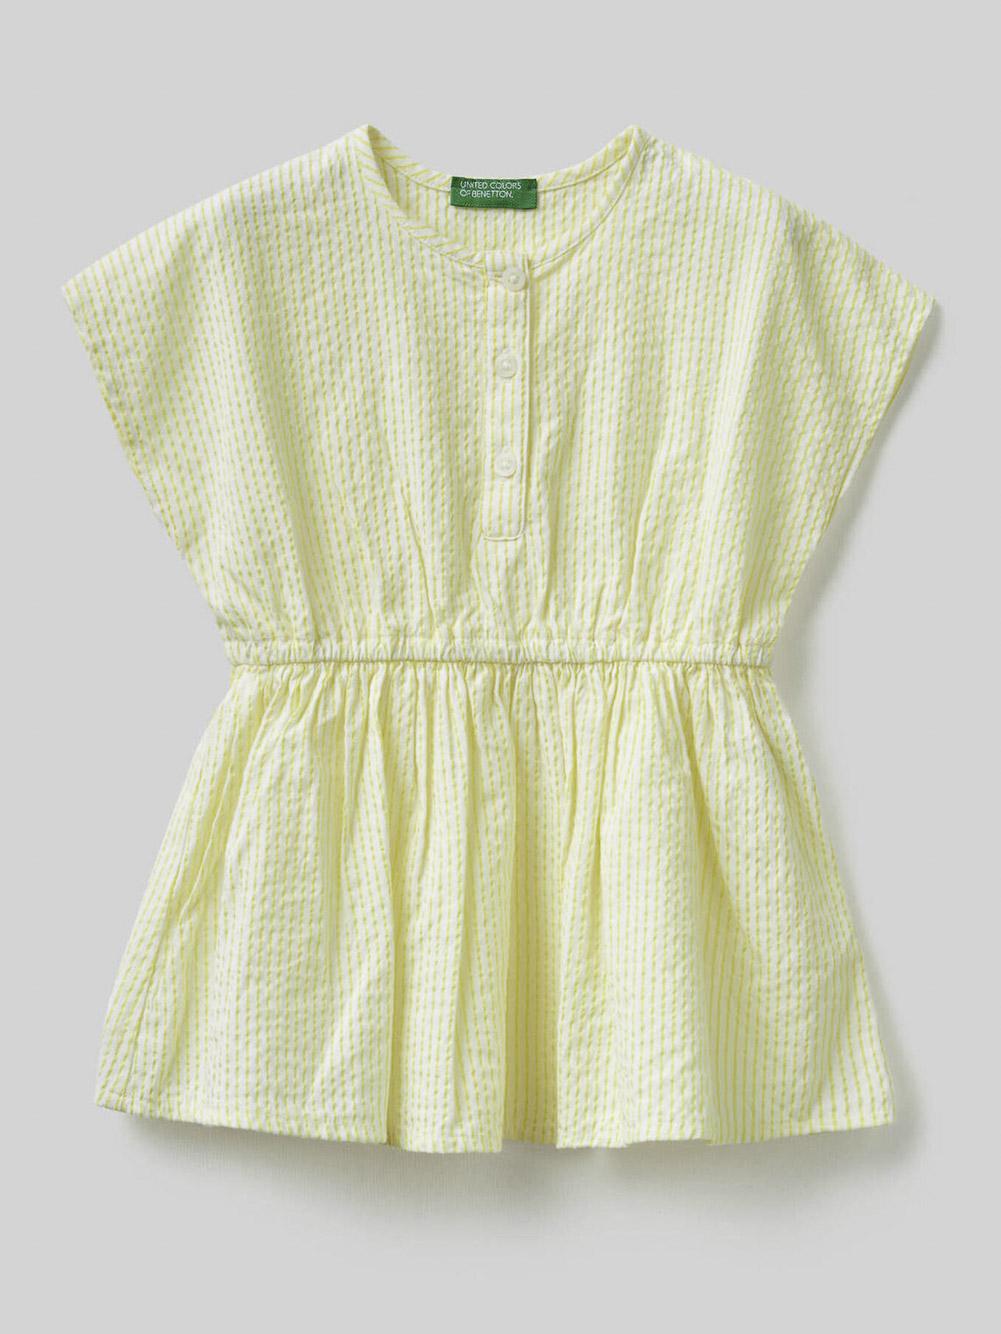 012 BENETTON Φόρεμα 4ANC5VFY0 21P901